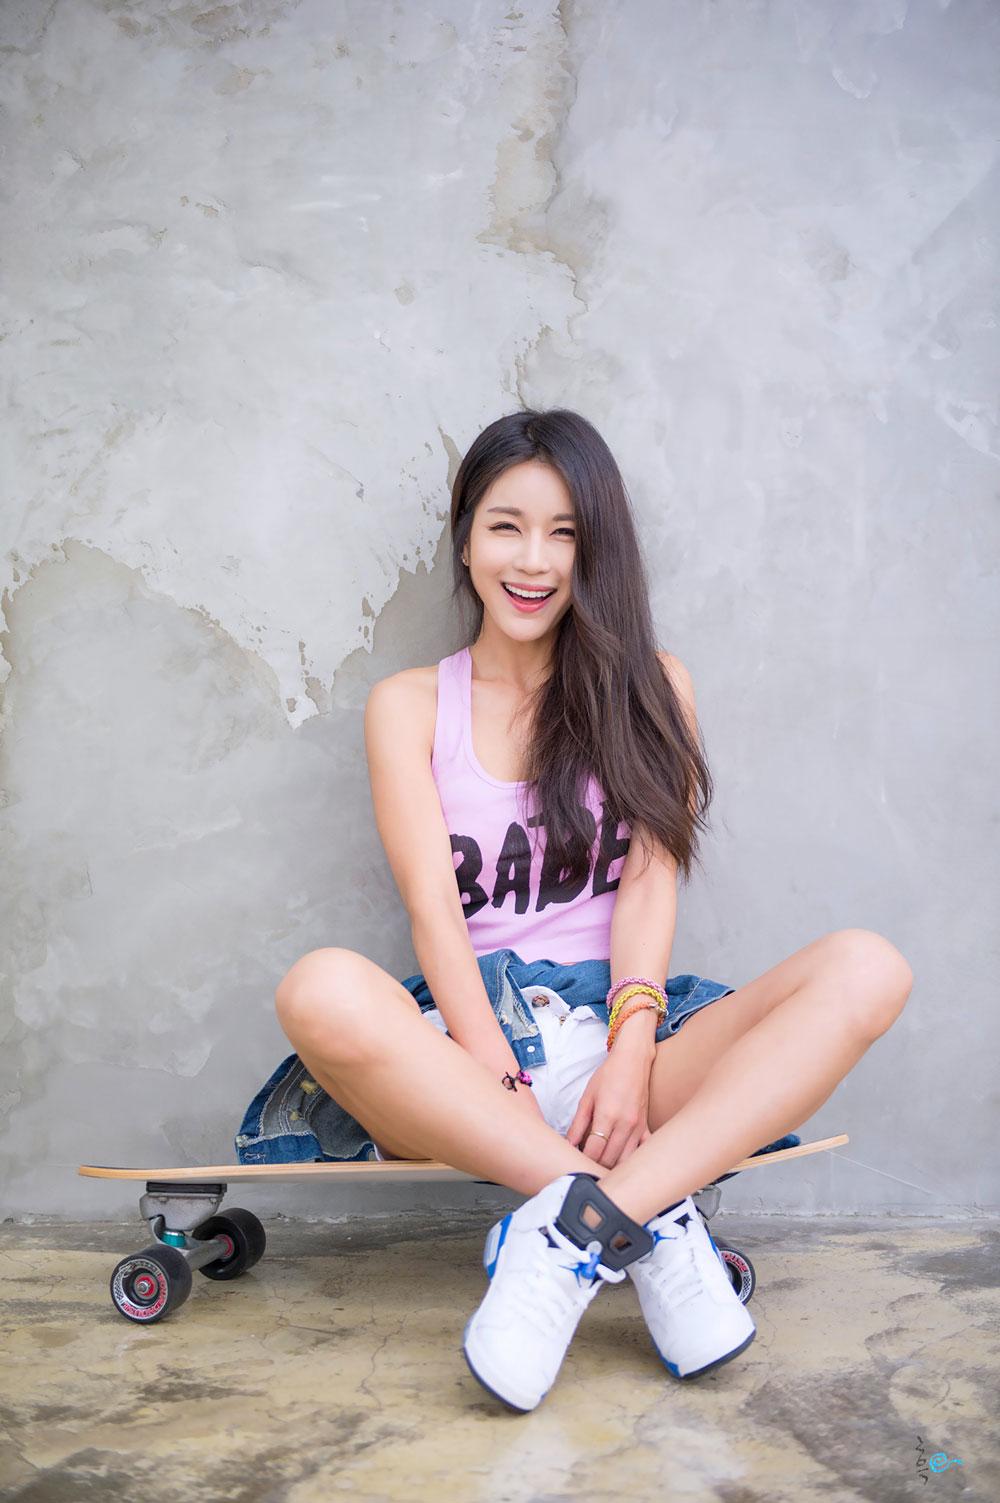 Park Si Hyun images